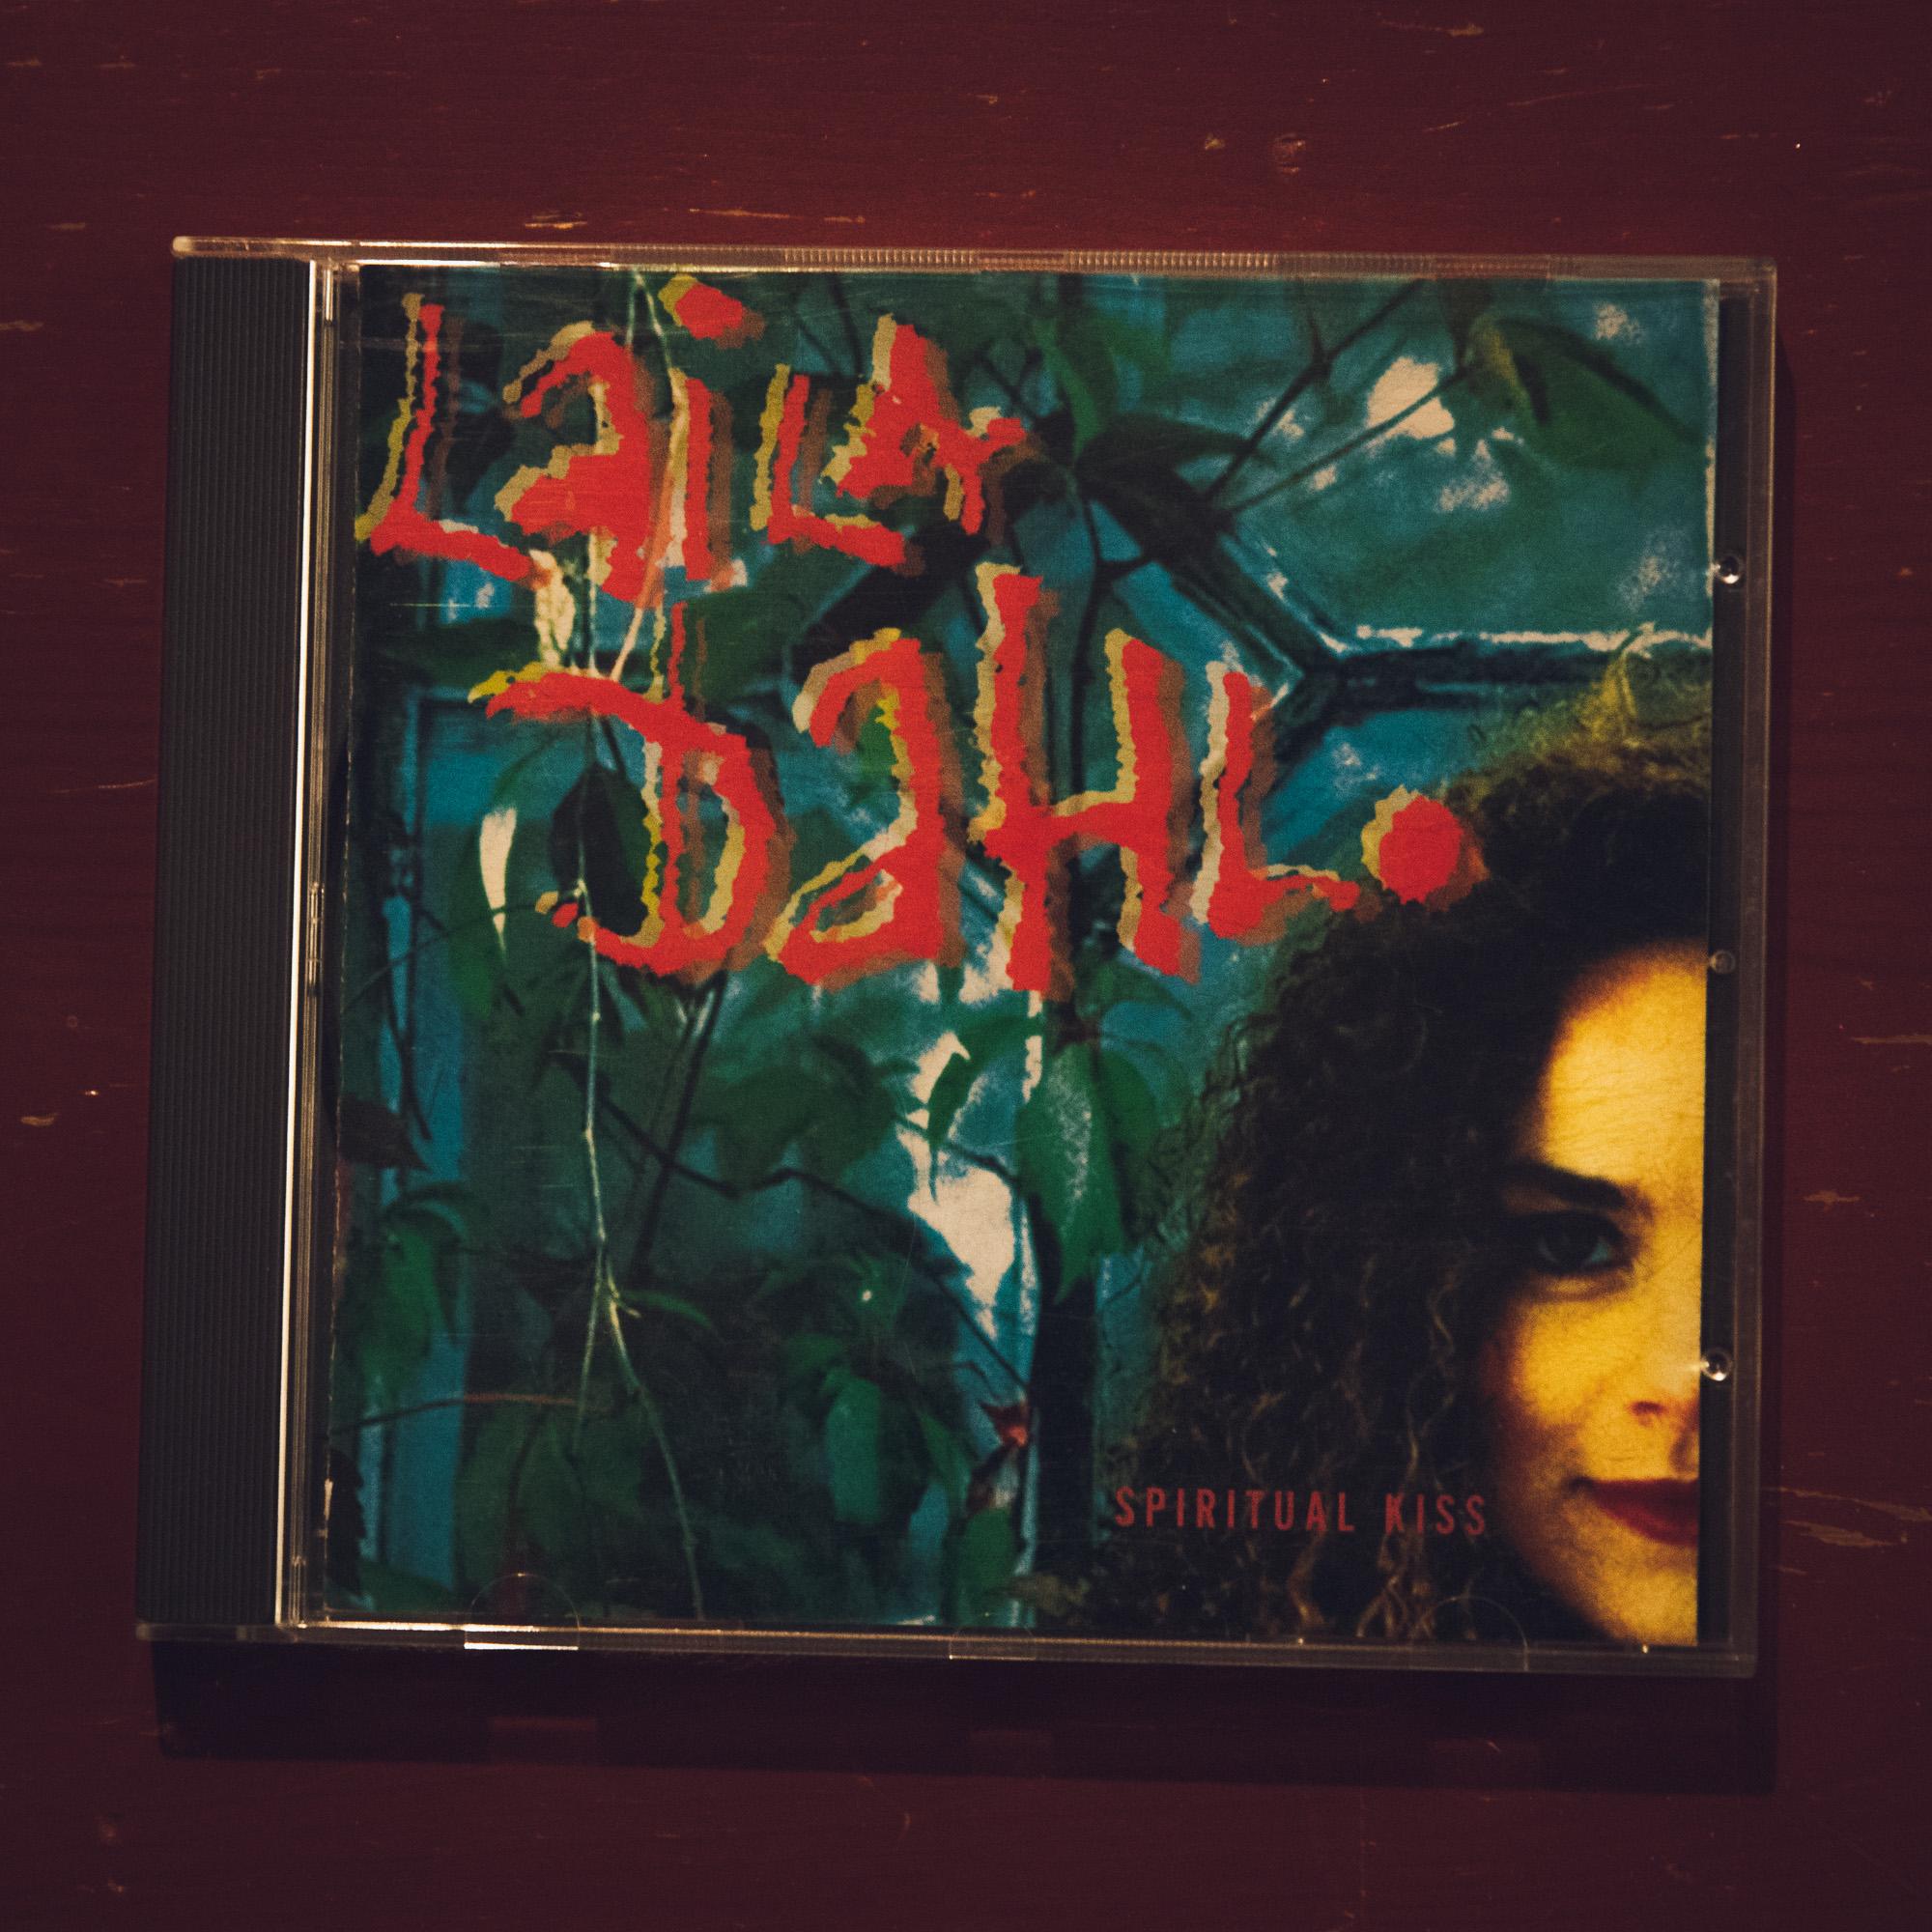 Skivomslag Laila Dahl Spiritual Kiss